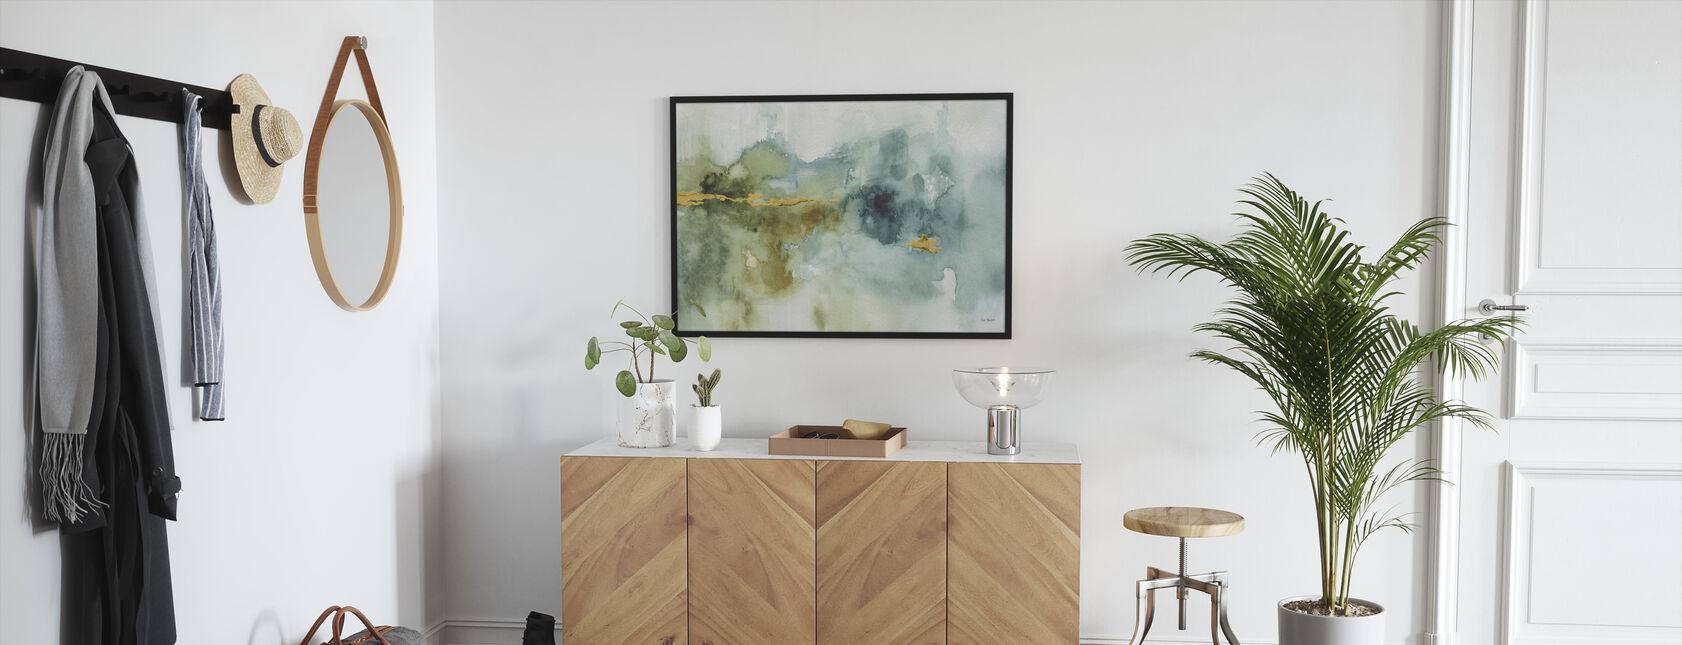 My Greenhouse Watercolor 4 - Framed print - Hallway